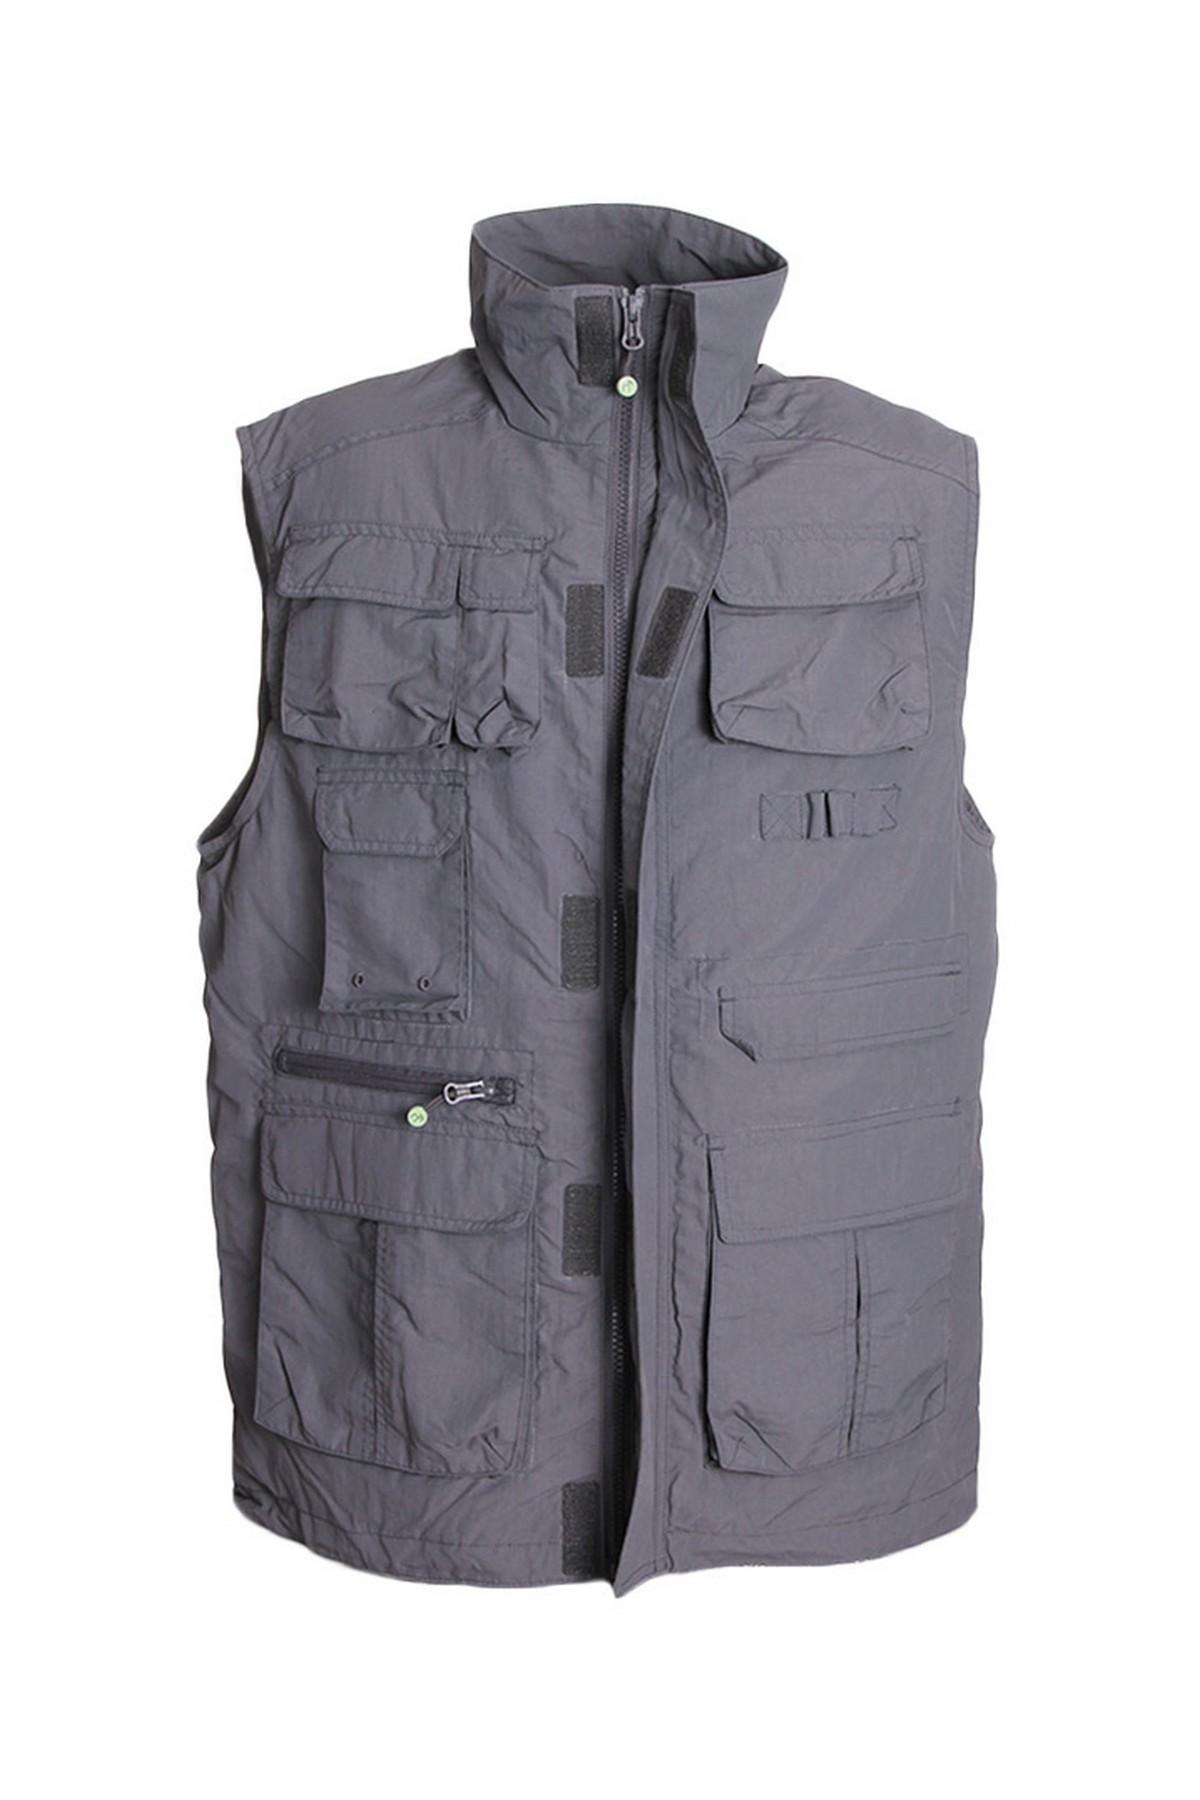 Free Camp Vest Erkek Balıkçı Yelek Gri (101418-GR)